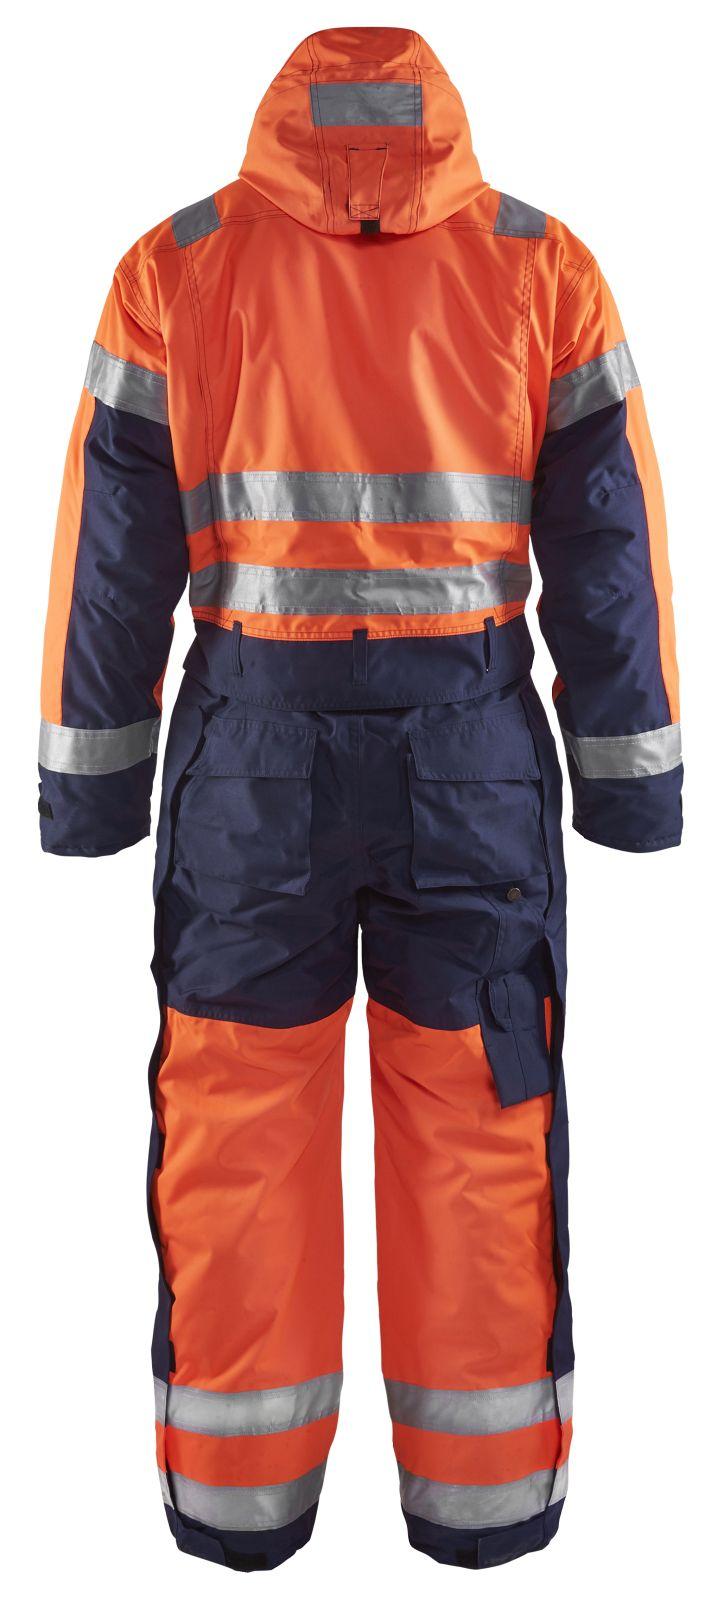 Blaklader Overalls 67631977 High Vis oranje-marineblauw(5389)